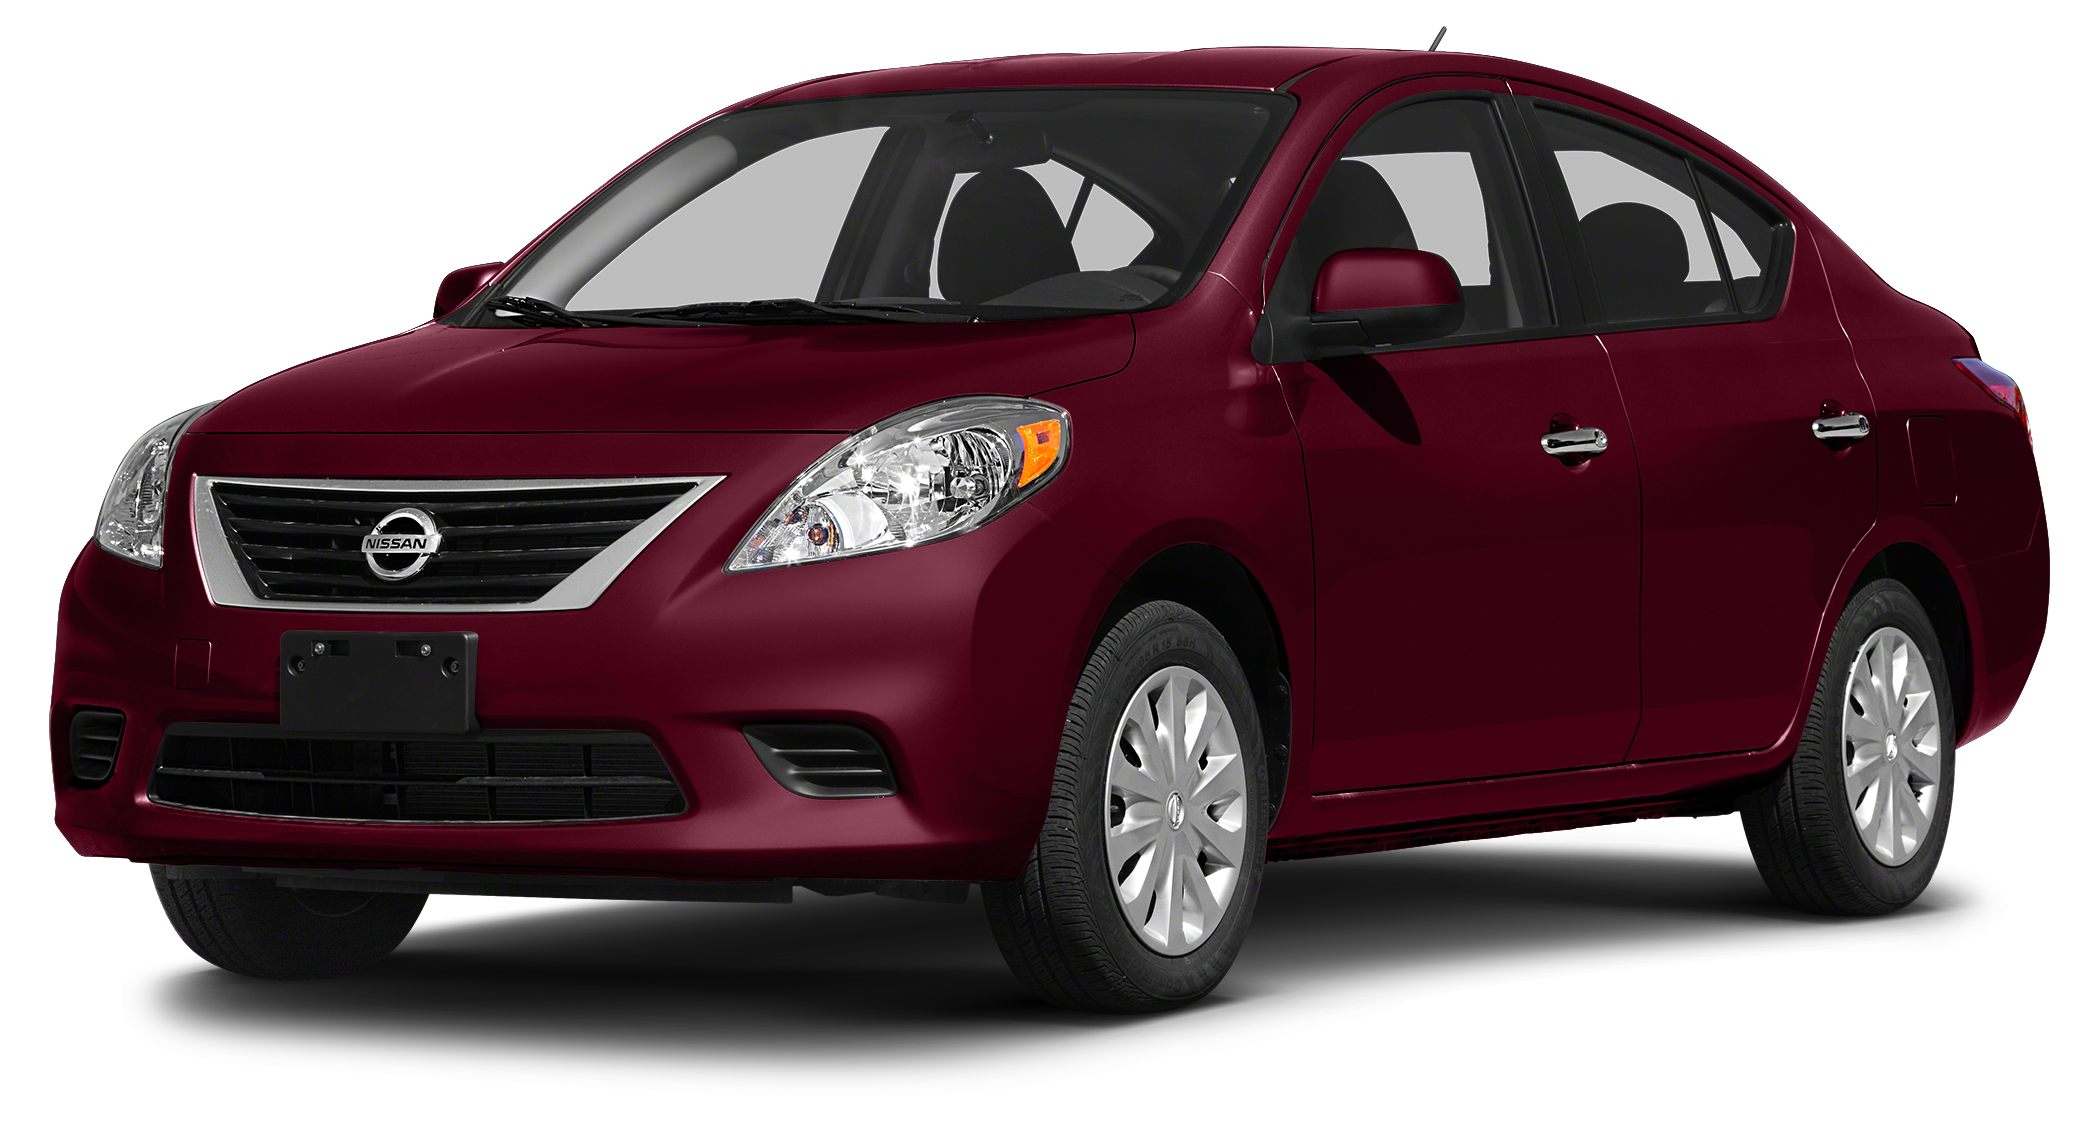 2014 Nissan Versa 16 SV Miles 45350Color Red Brick Stock ZP847102 VIN 3N1CN7AP0EL847102